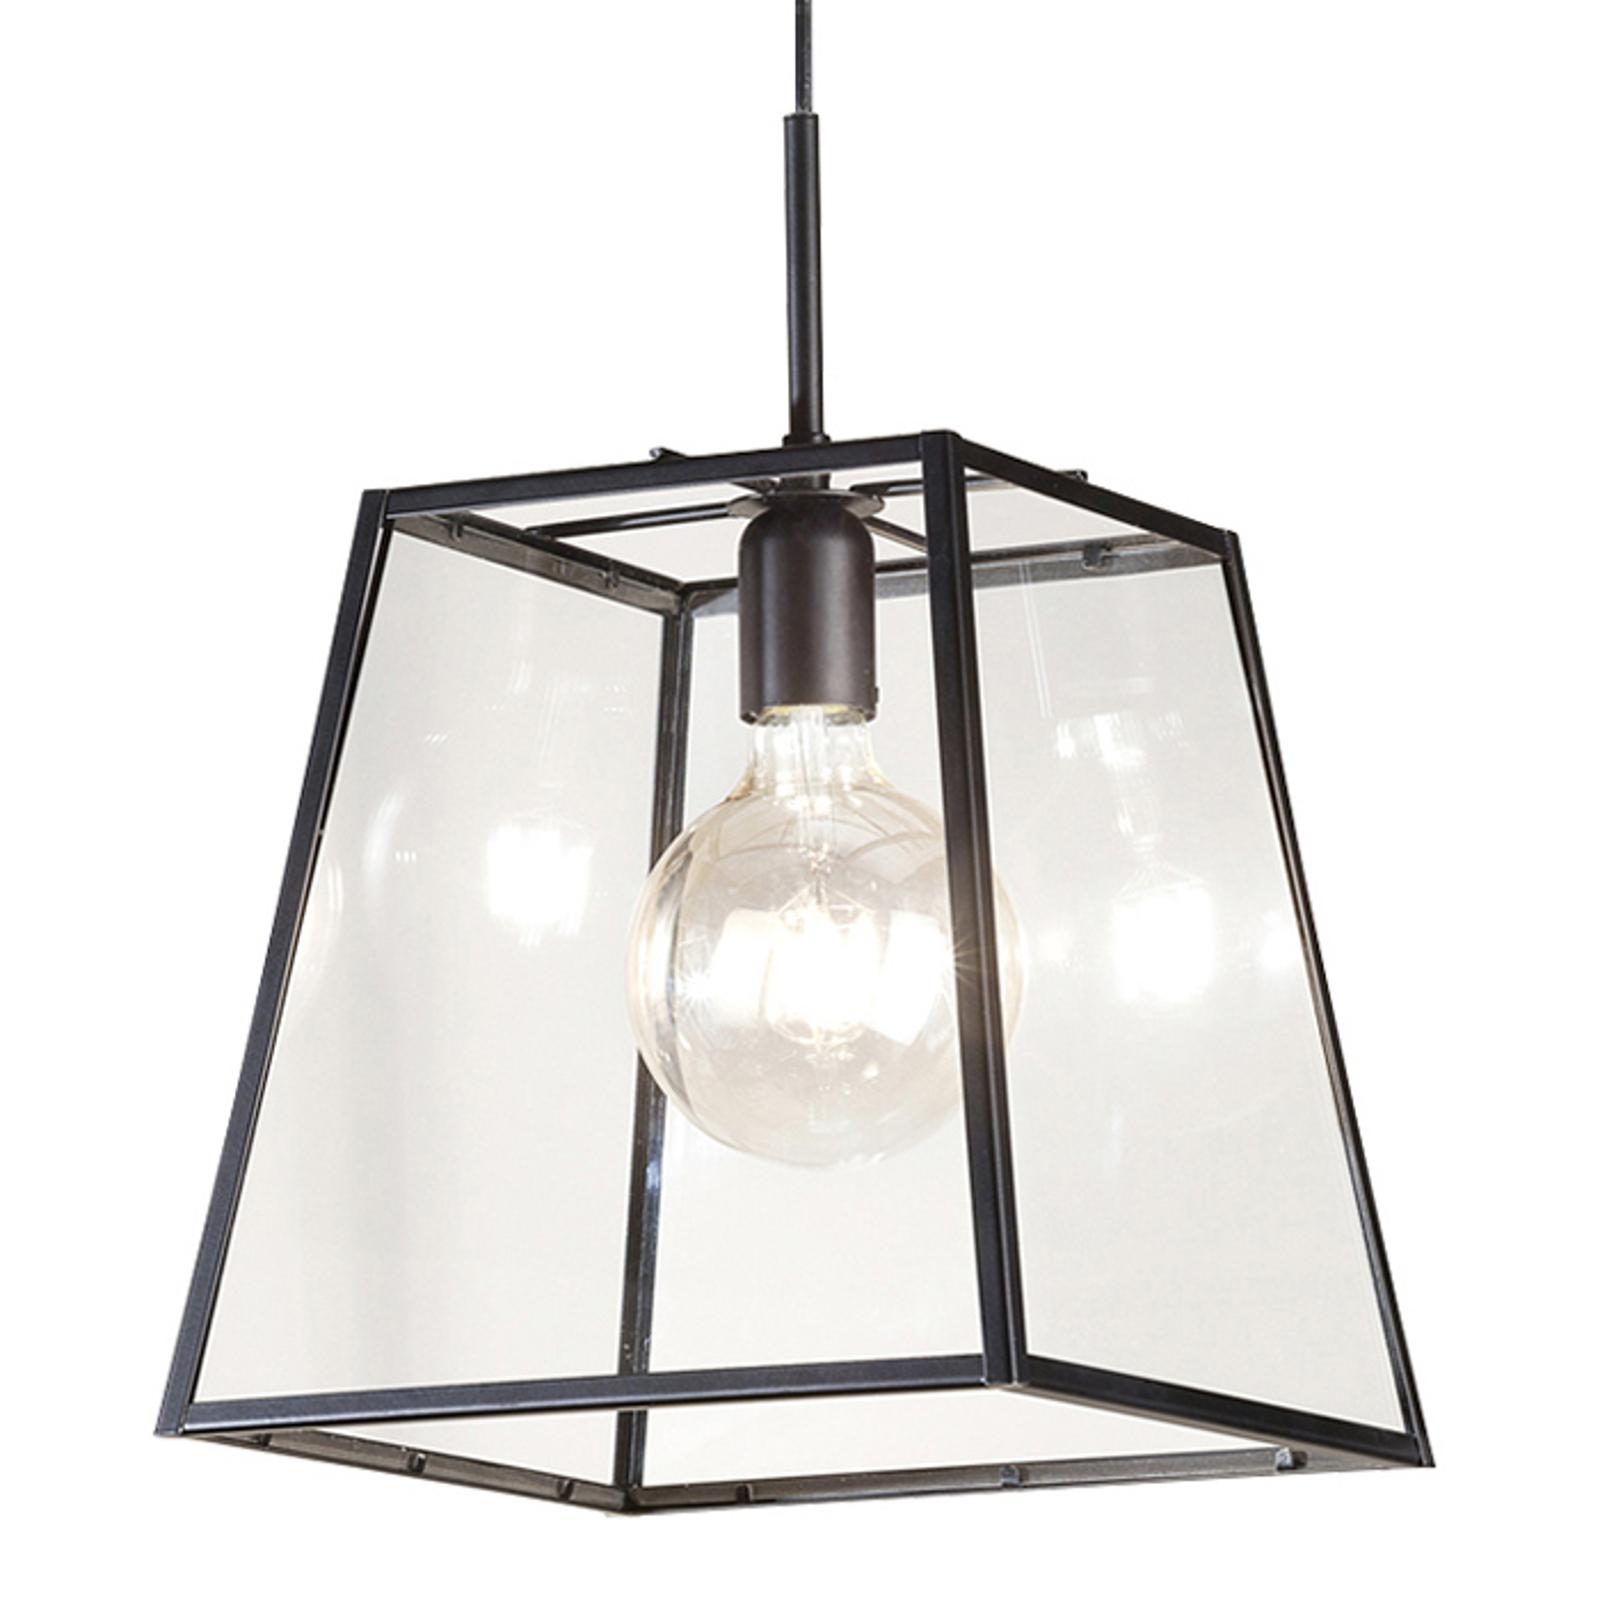 Oryginalna lampa wisząca Troja